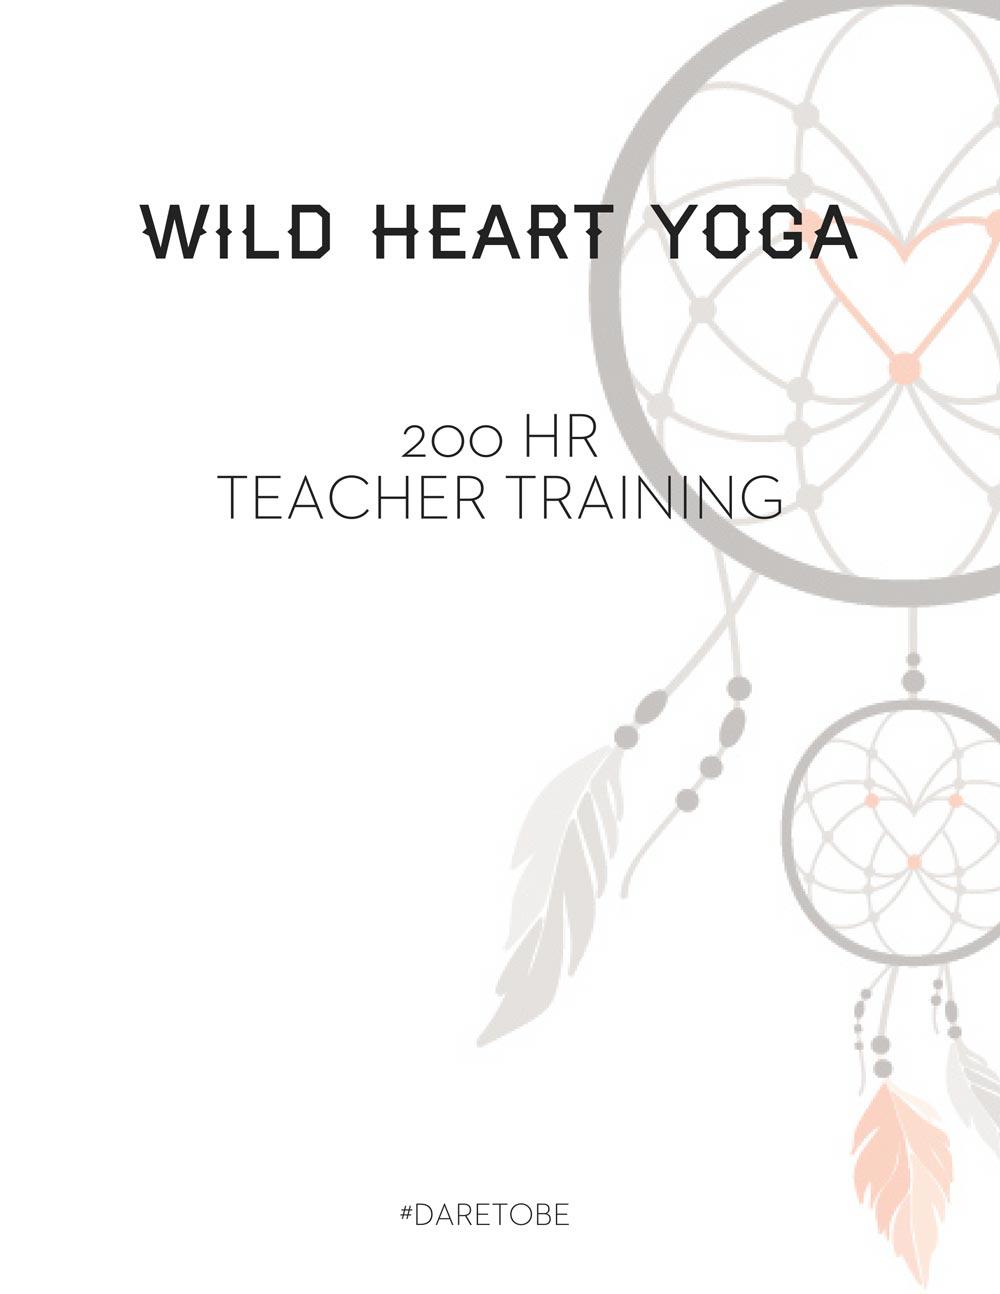 Wild-Heart-Yoga-Teacher-Training-Manual-by-Weston-Carls.jpg